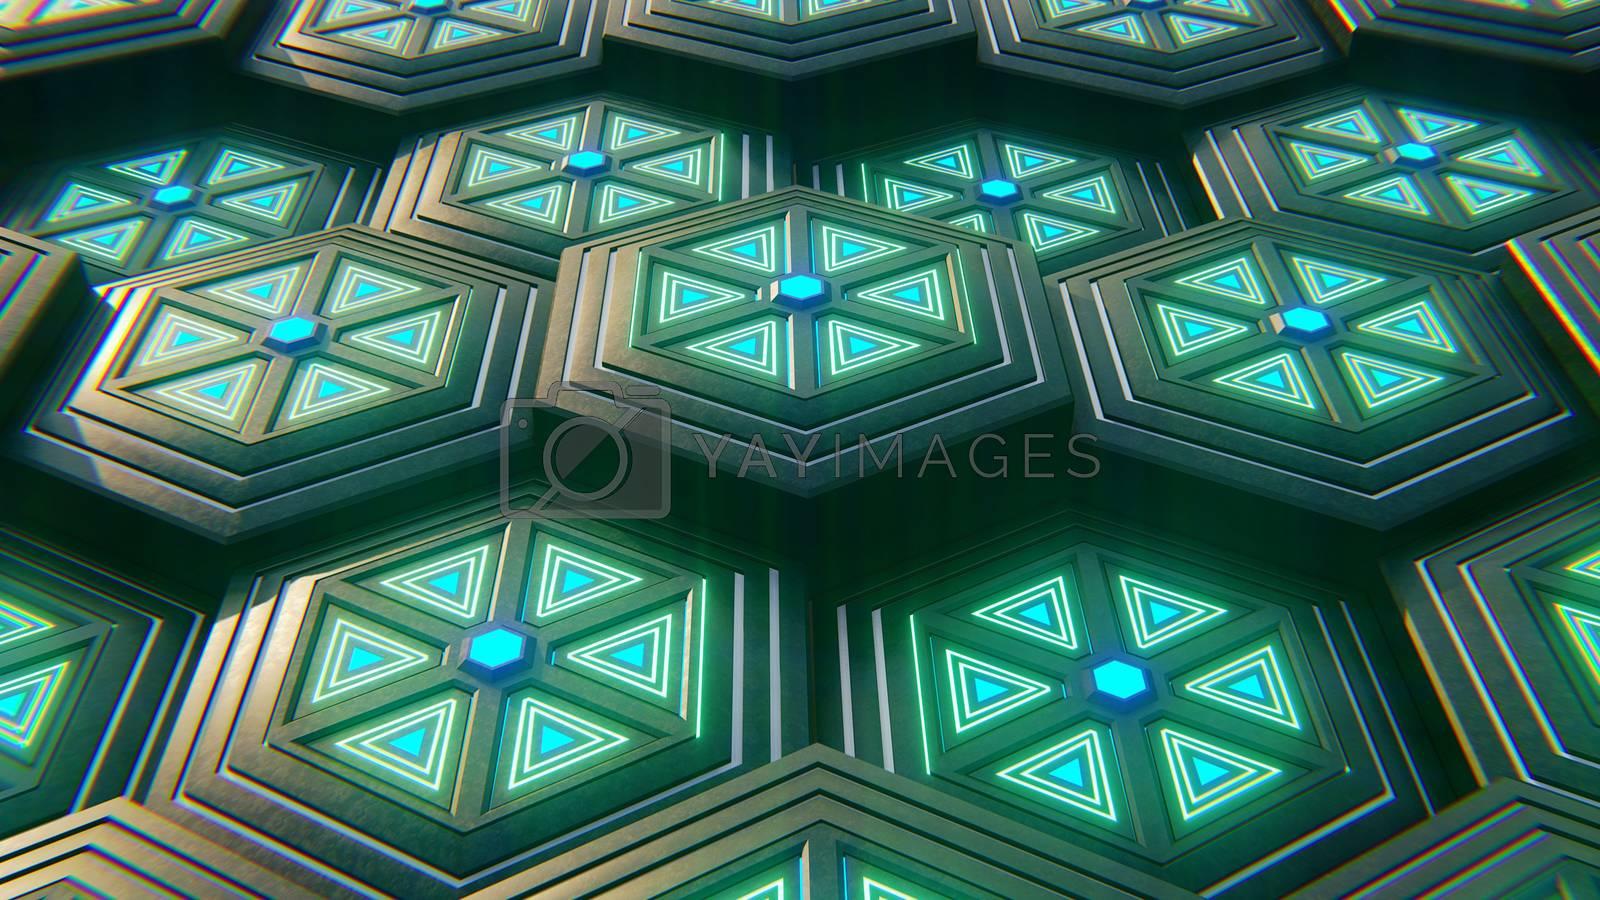 Black blue and orange hexagons background. Modern background. 3d by Teerawit Tj-rabbit